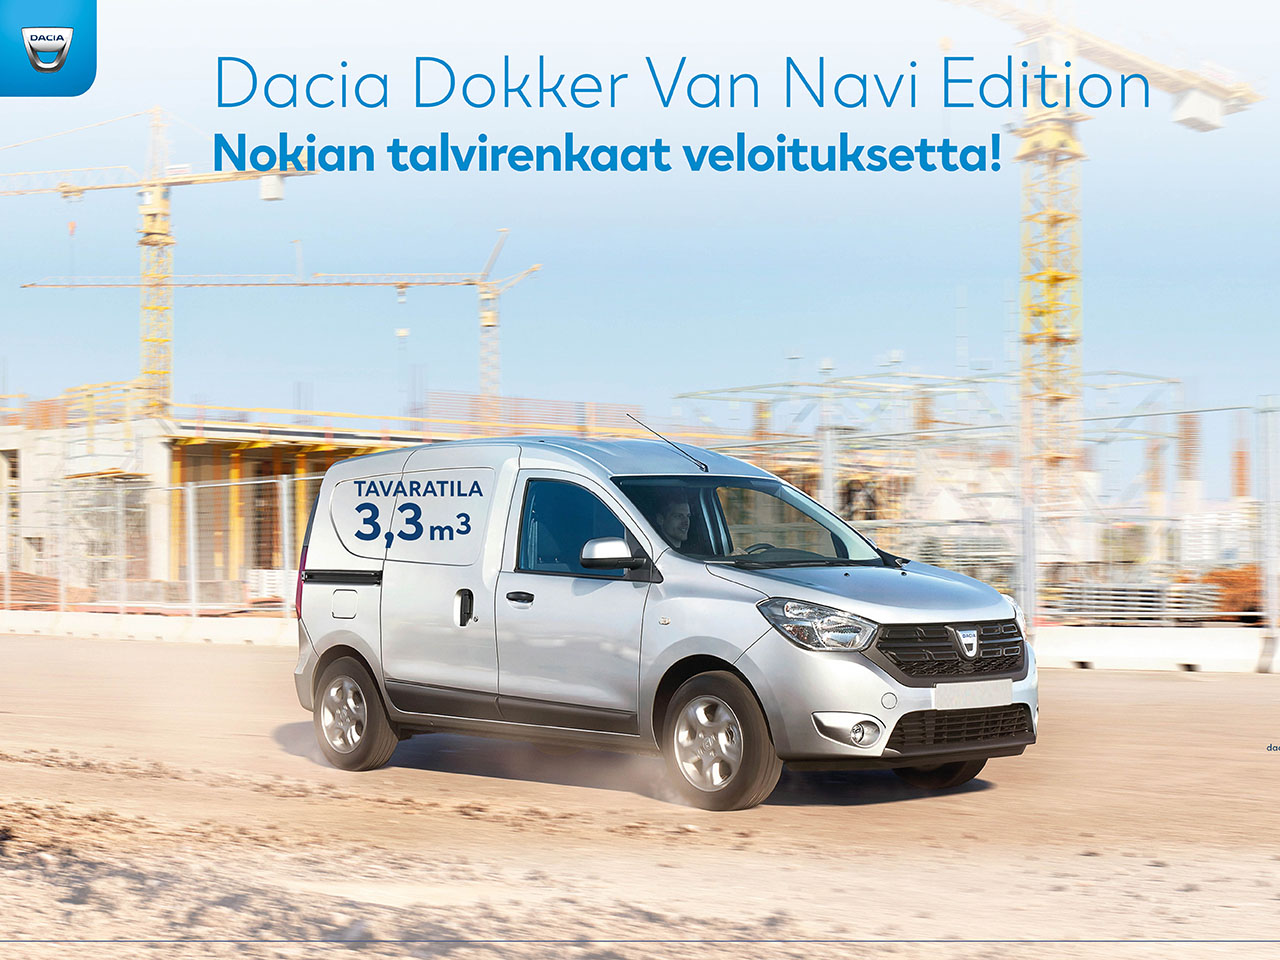 Dacia Dokker Van Navi Edition huippueduilla